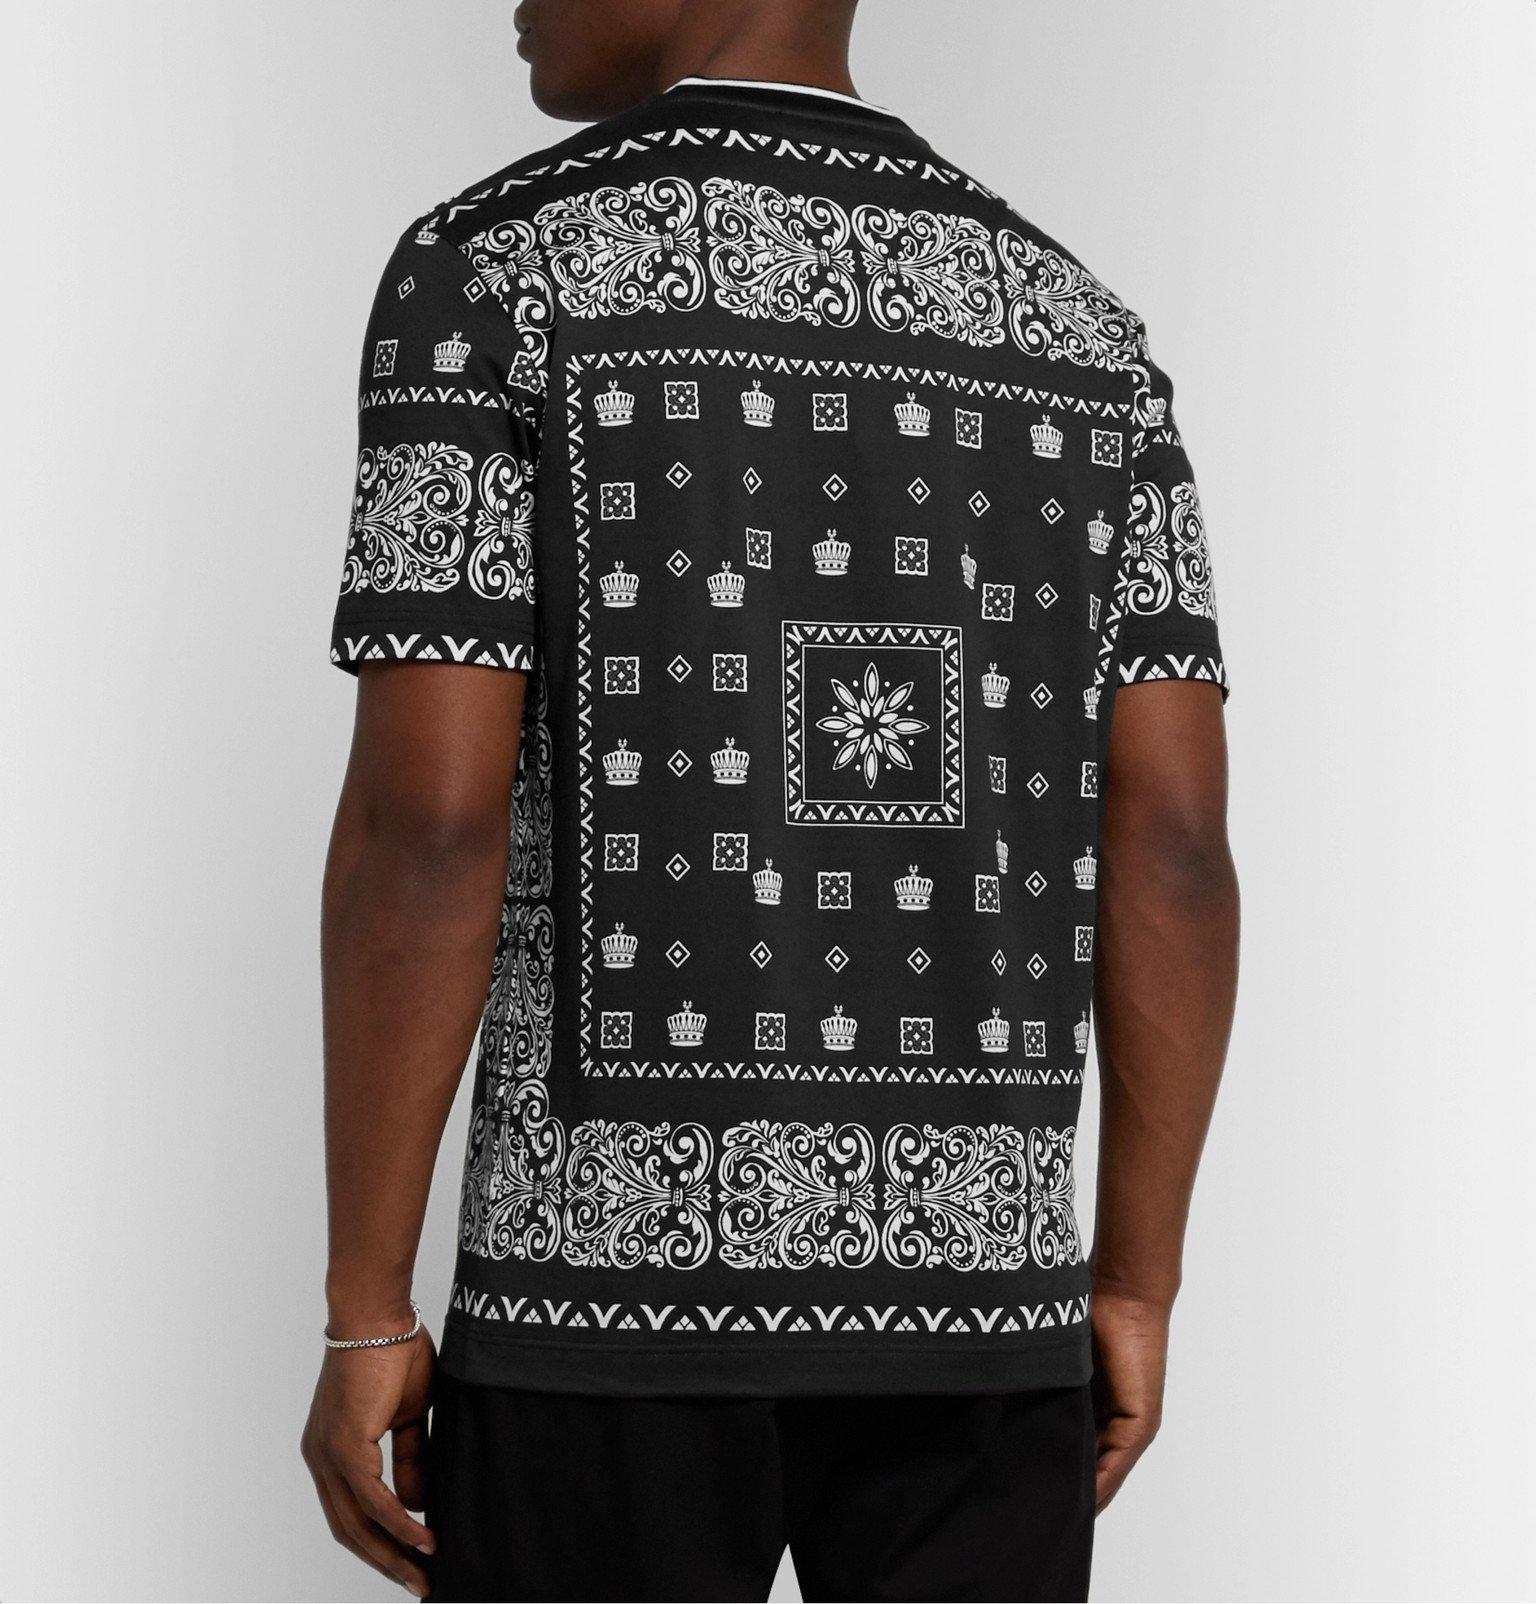 Dolce & Gabbana - Slim-Fit Printed Cotton-Jersey T-Shirt - Black